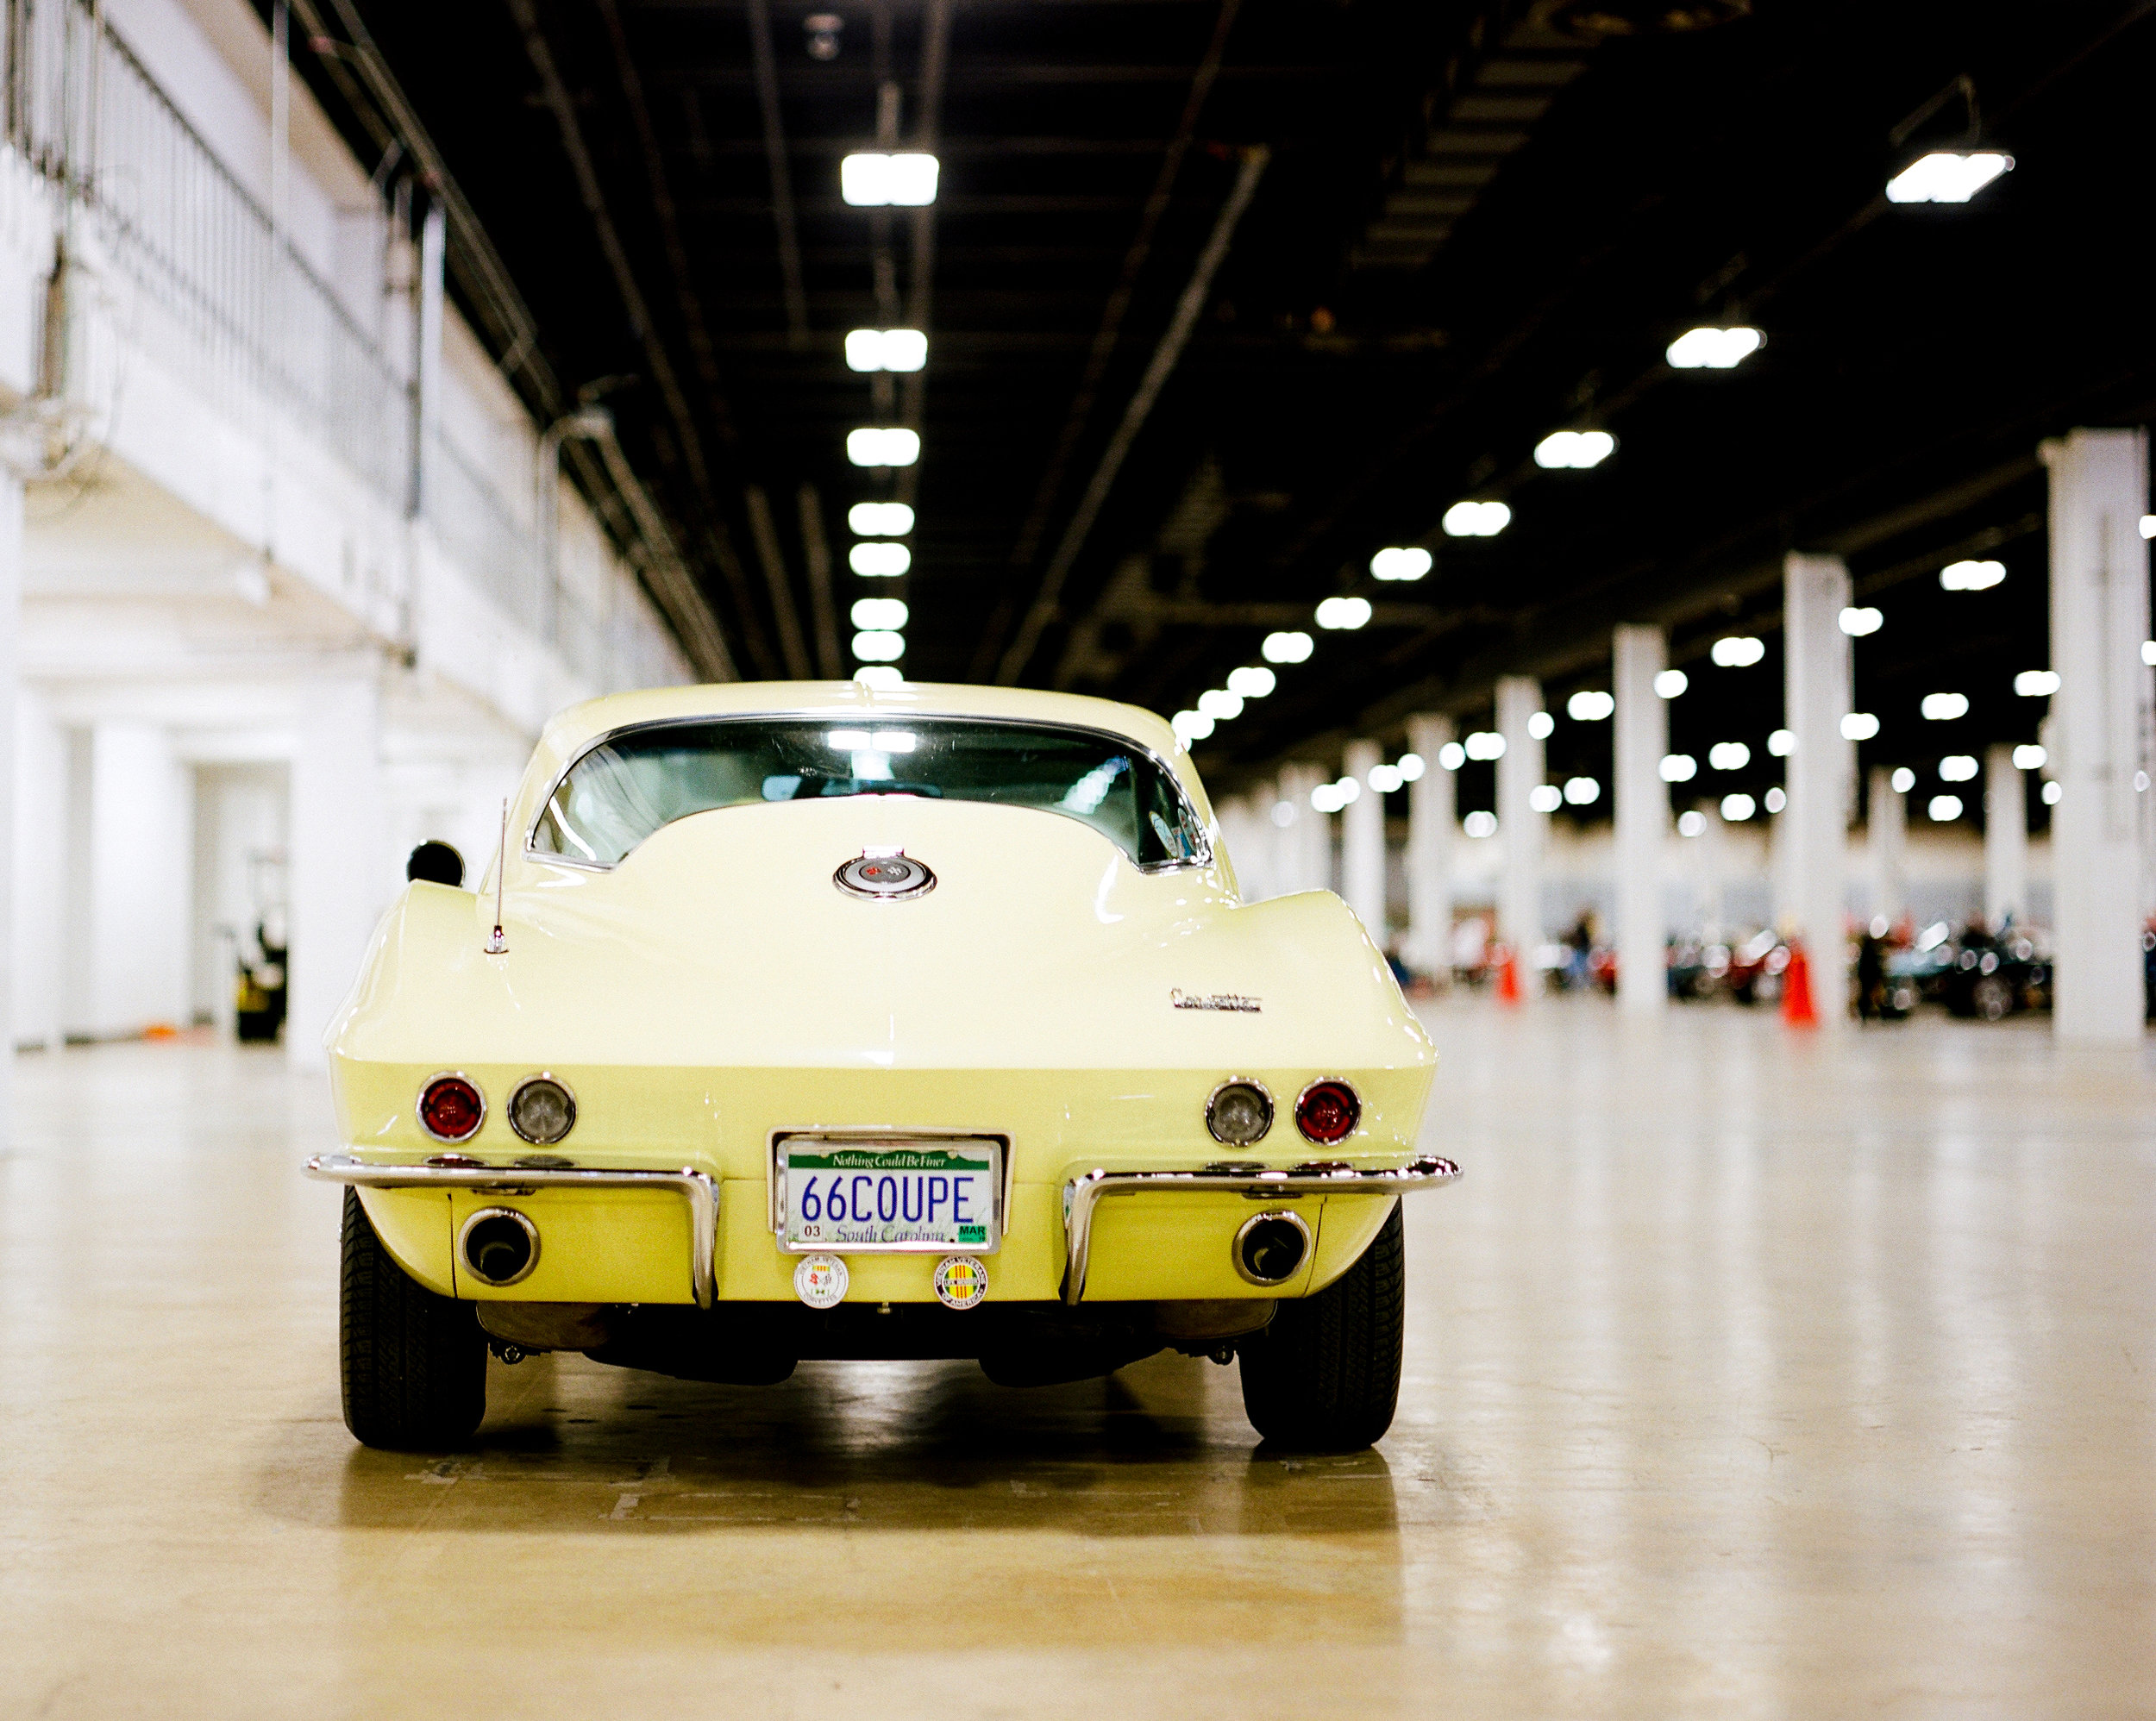 1966 Corvette at NCRS Regional Show in Greenville, South Carolina ■ Pentax 6x7 ■ Kodak Portra 400